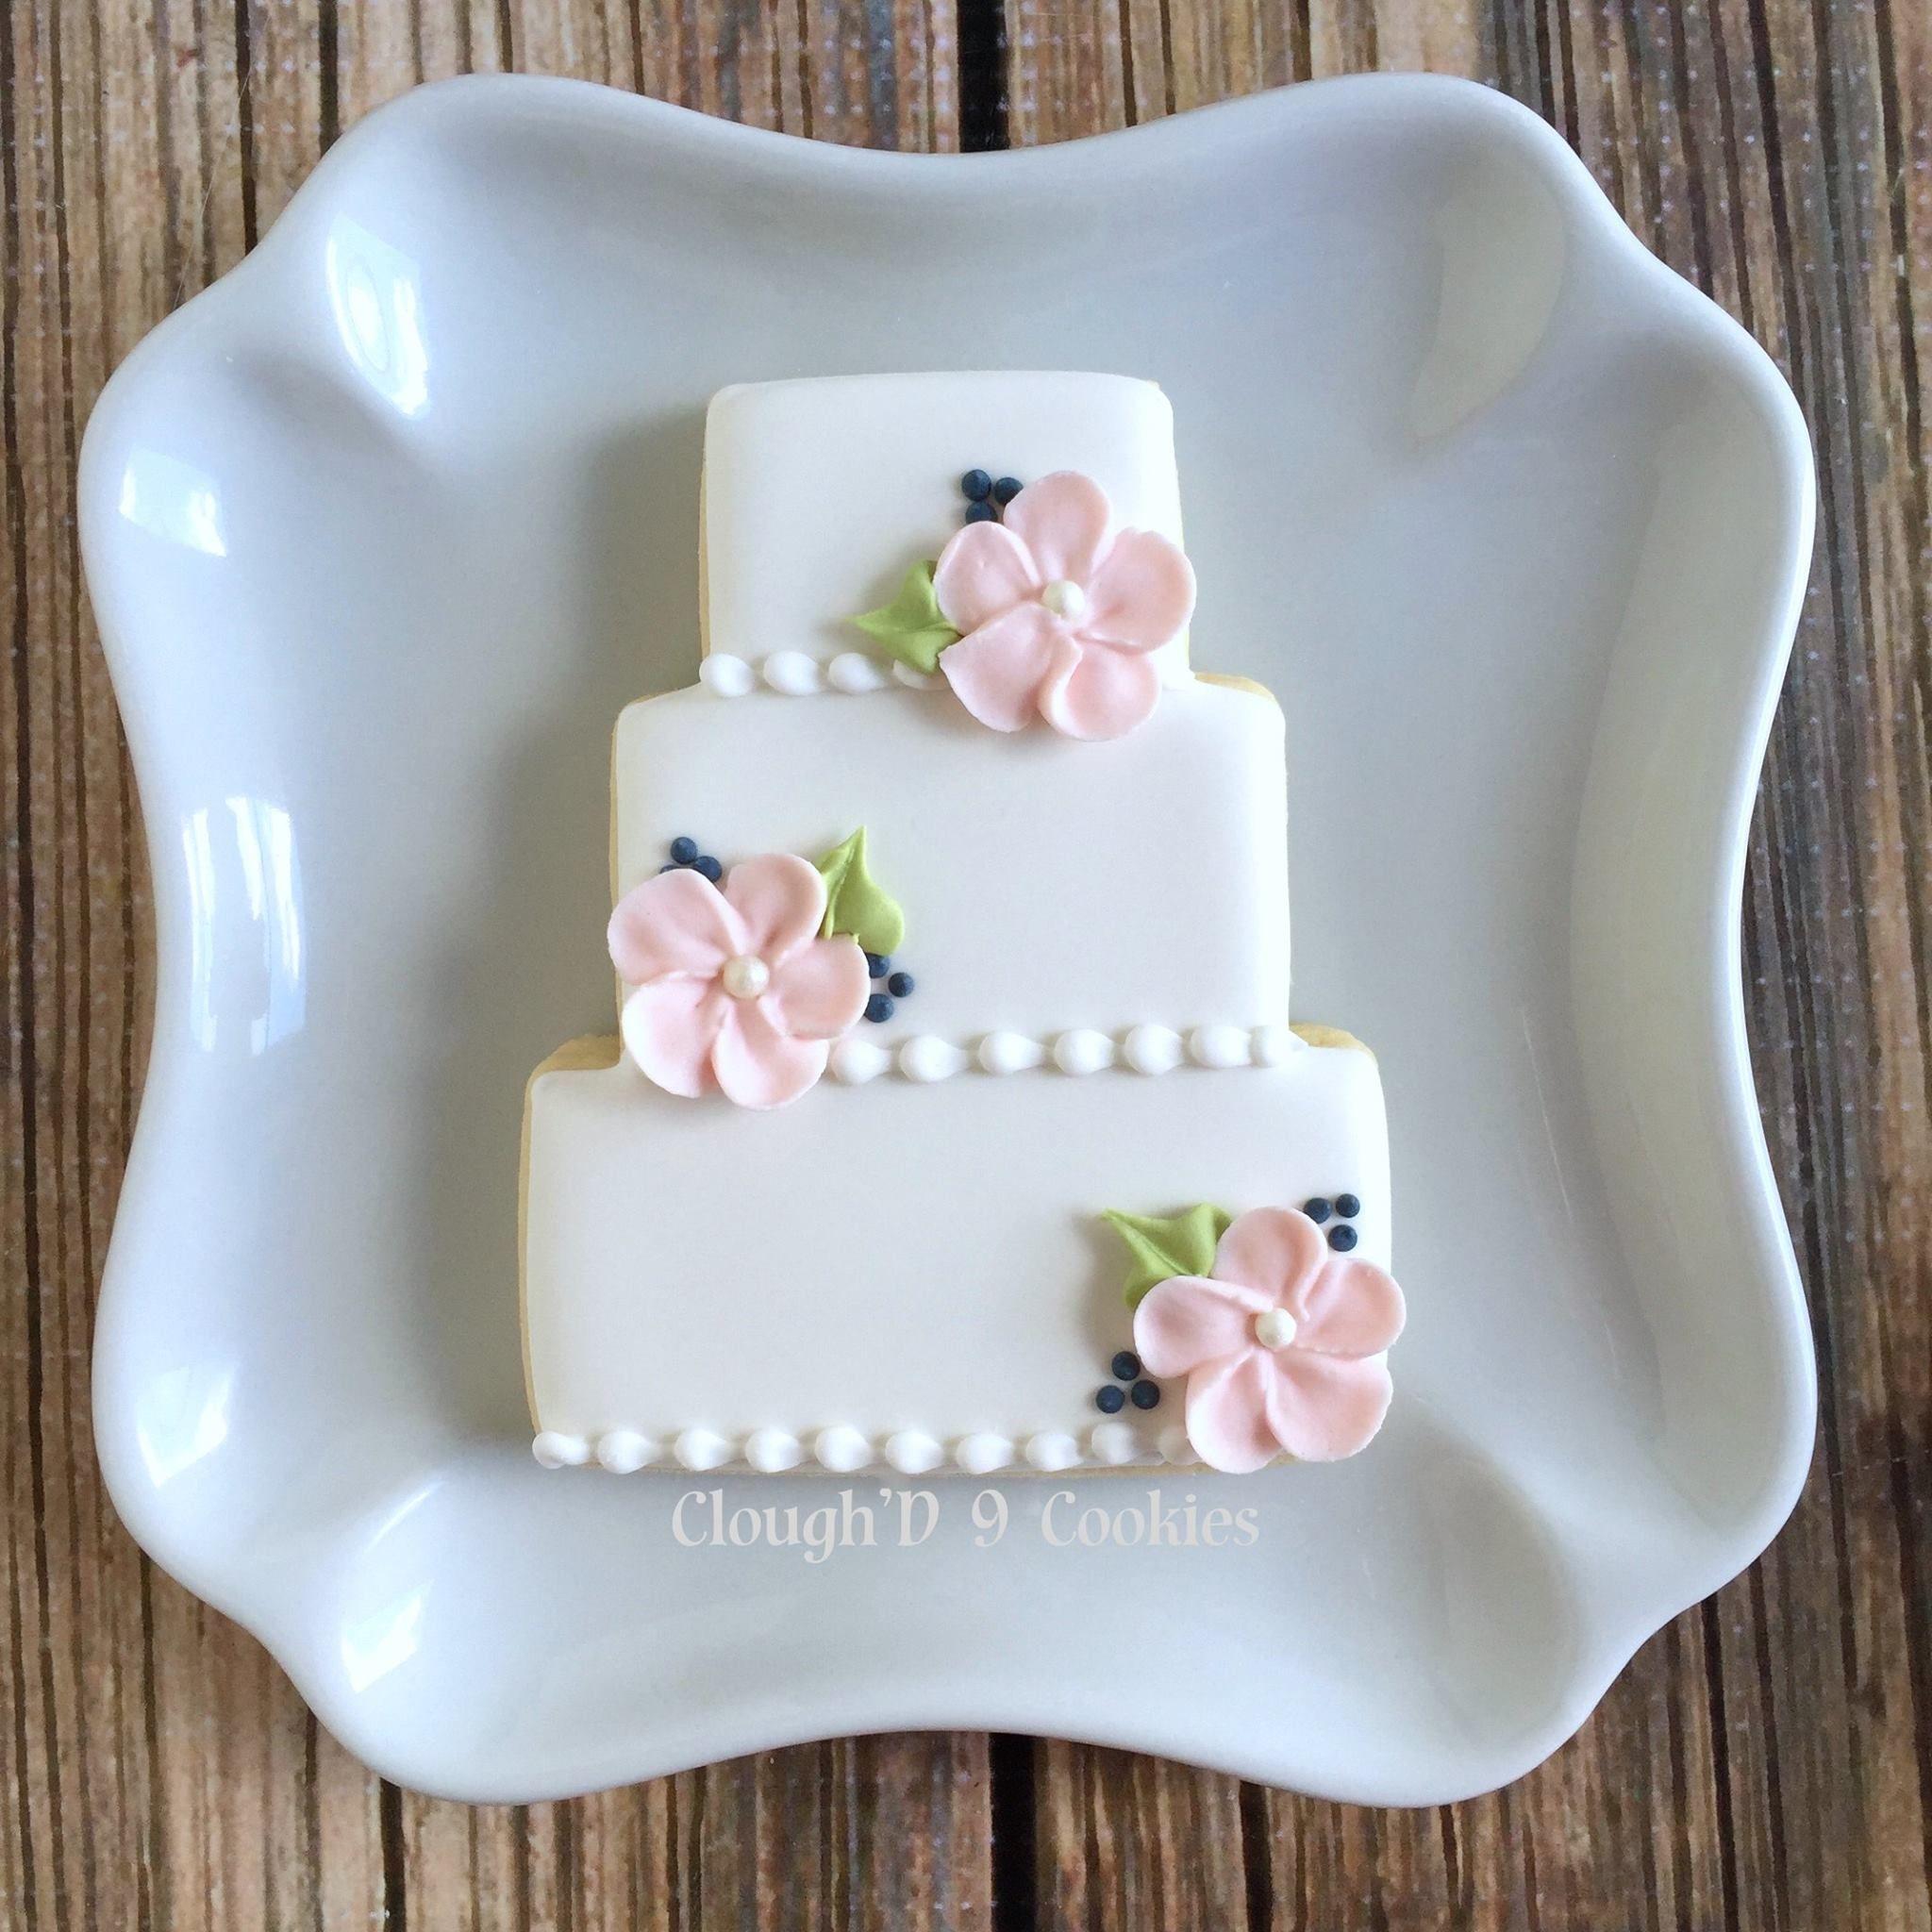 Wedding Cake Recipe Custom History: Clough'D 9 Cookies & Sweets (royal Icing Cookies Wedding